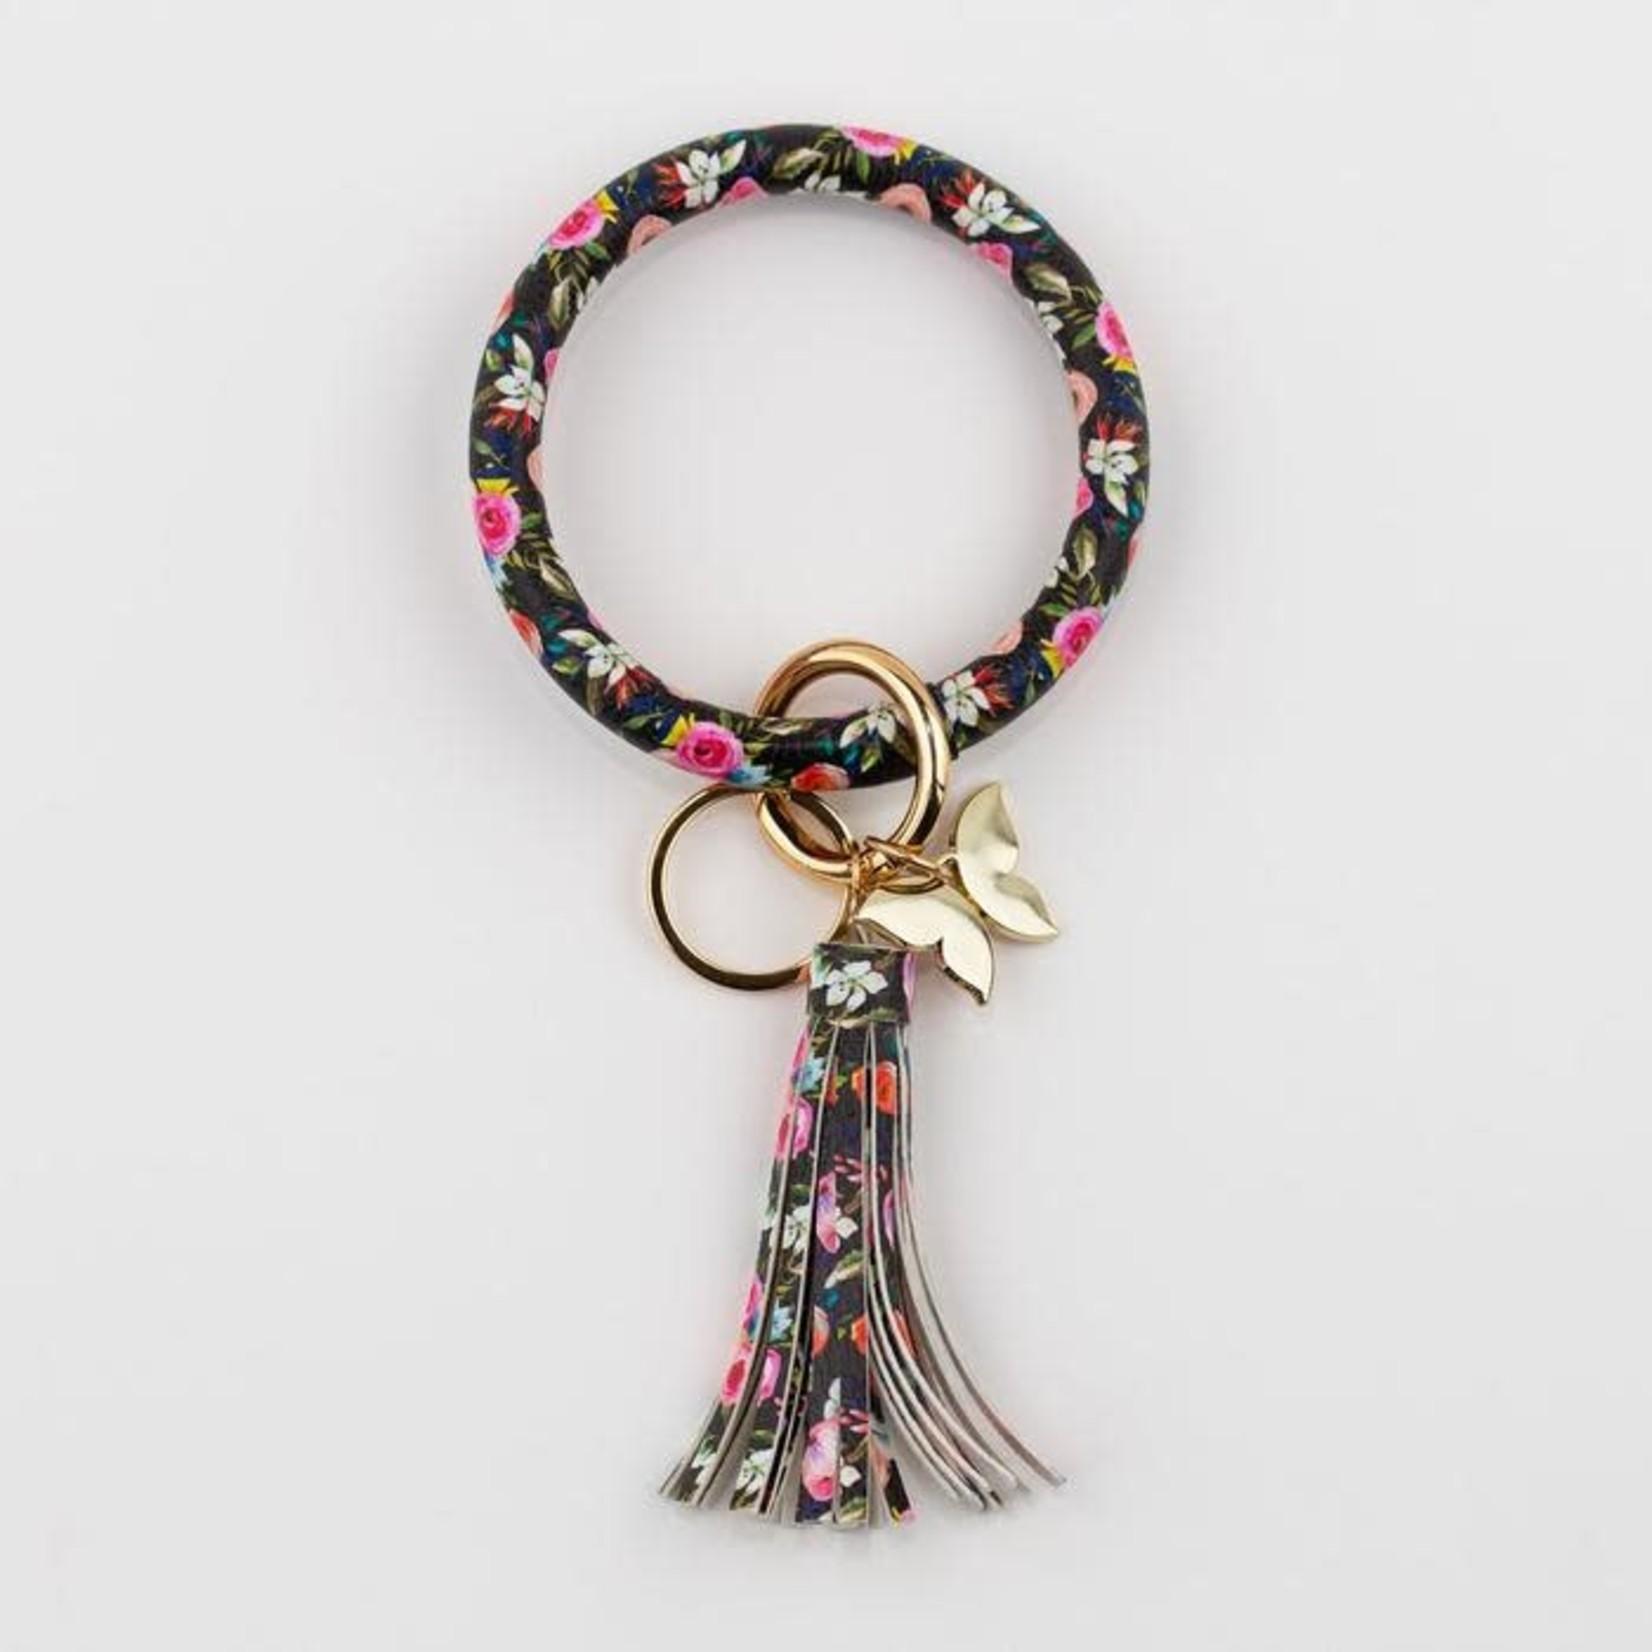 Bangle Key Ring - Floral on Black